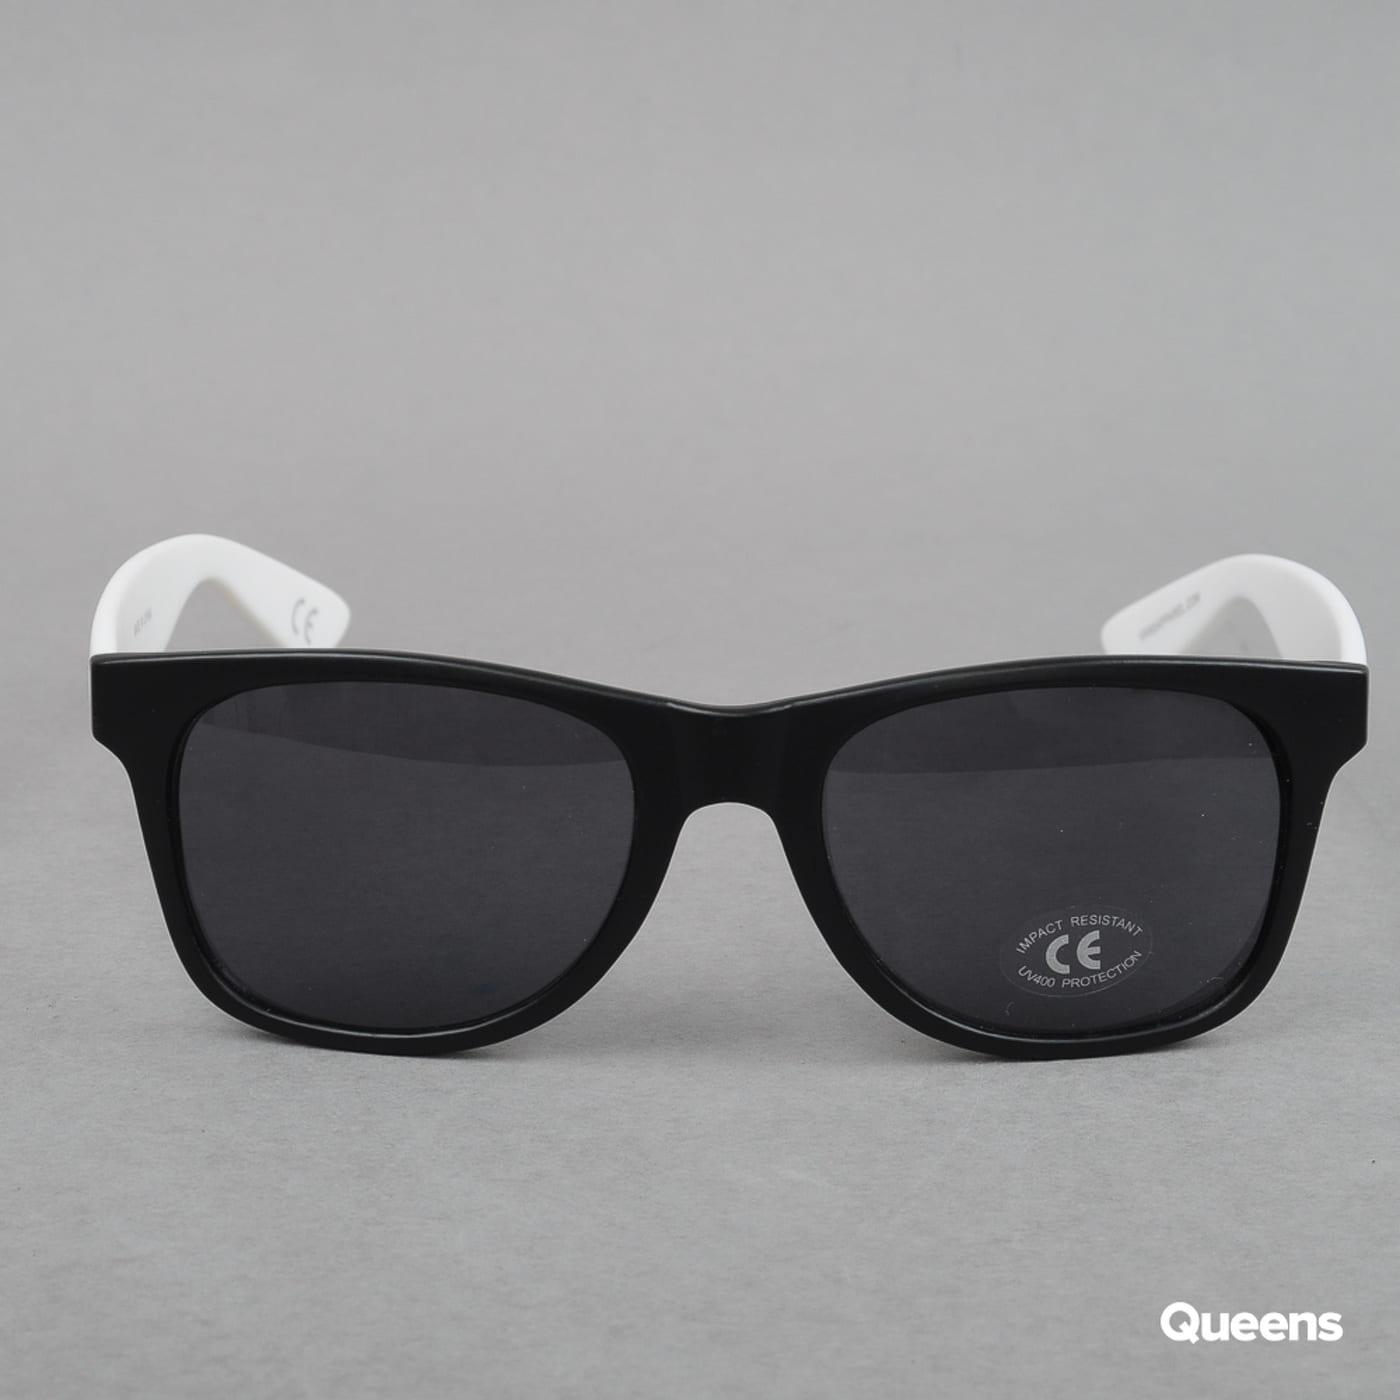 Vans Spicoli 4 Shades čierne / biele